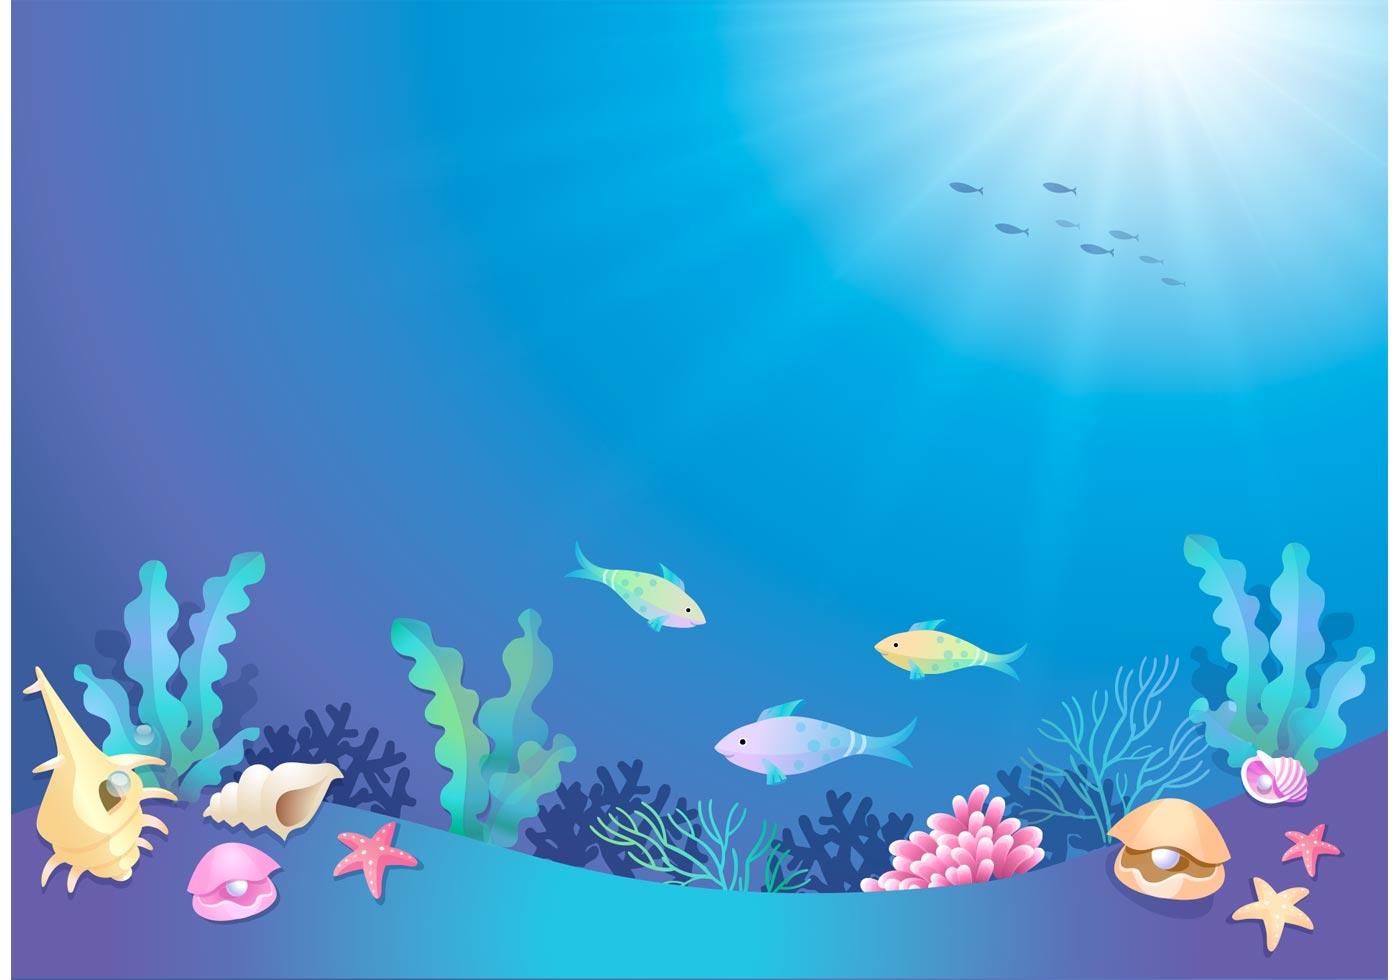 free vector cartoon underwater world download free Blue Paint Brush Cartoon Clip Art Pink Paint Brush Cartoon